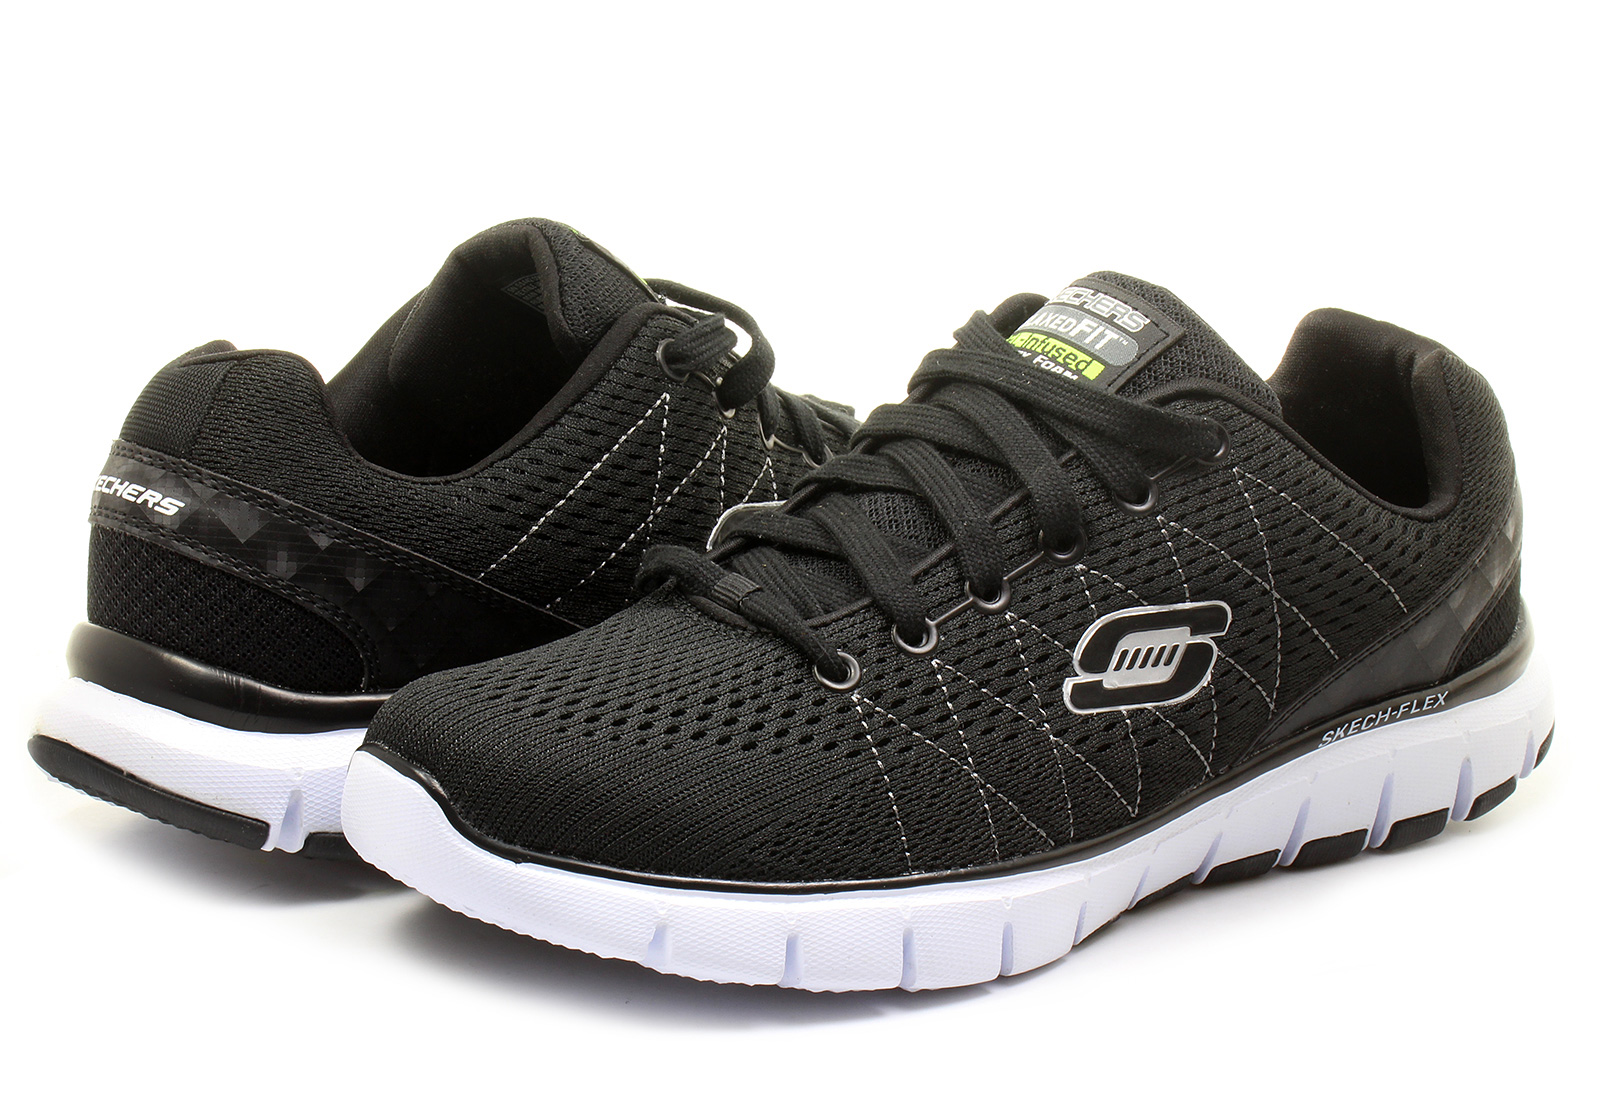 Skechers Shoes Skech Flex 51442 Bkw Online Shop For